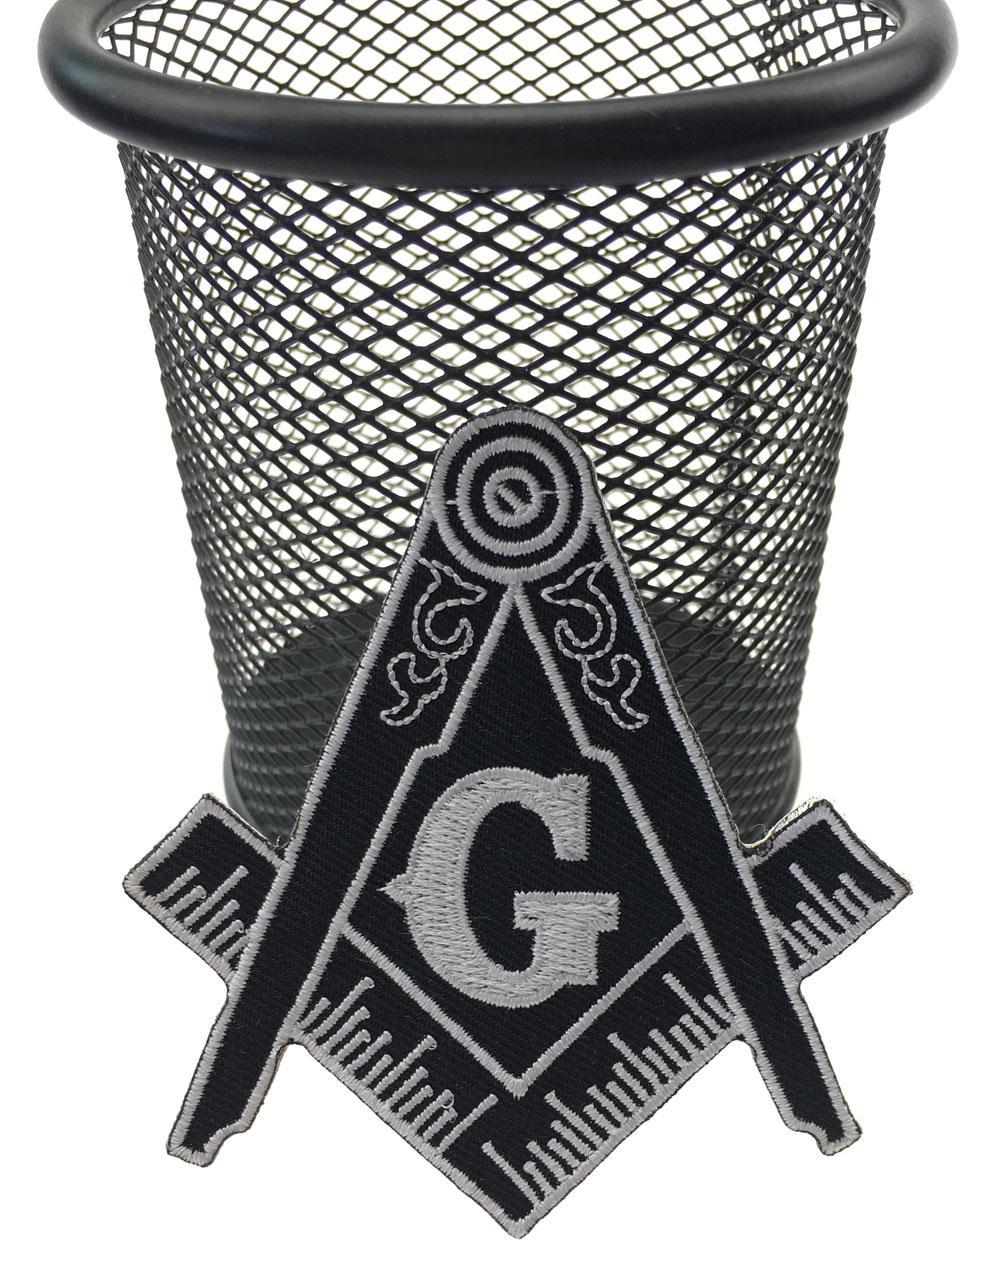 Hot Sale!Masonic Compass Patch Embroidered Iron-On Clothing Freemason Lodge Emblem Mason G Badge Sew On Any Garment